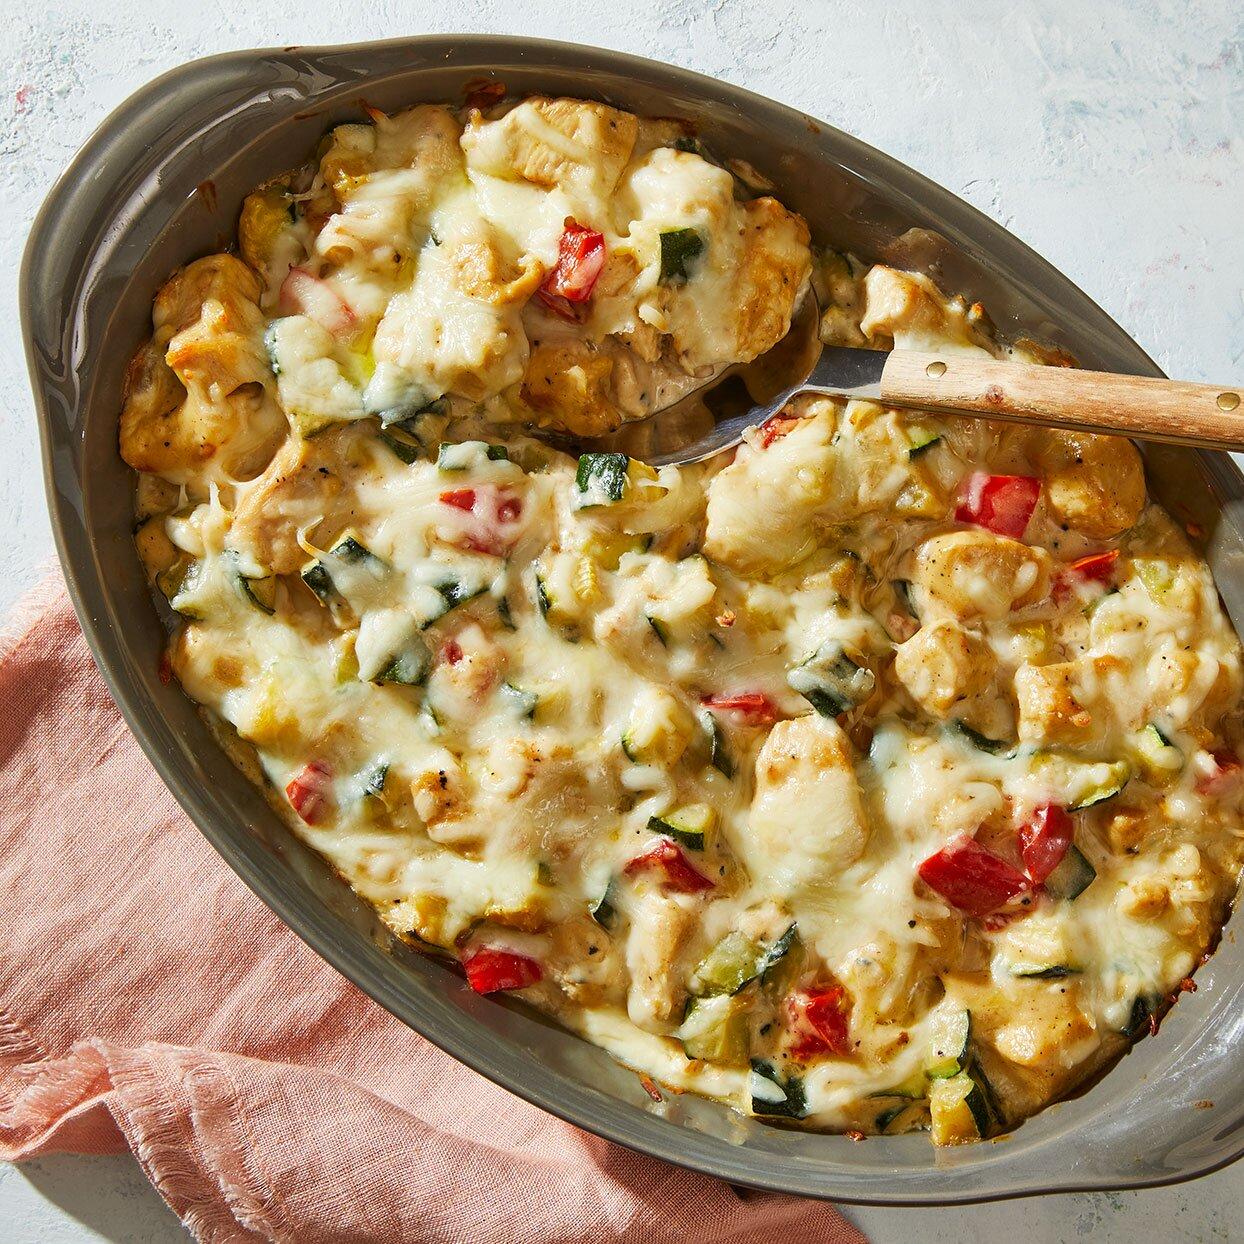 Chicken & Zucchini Casserole